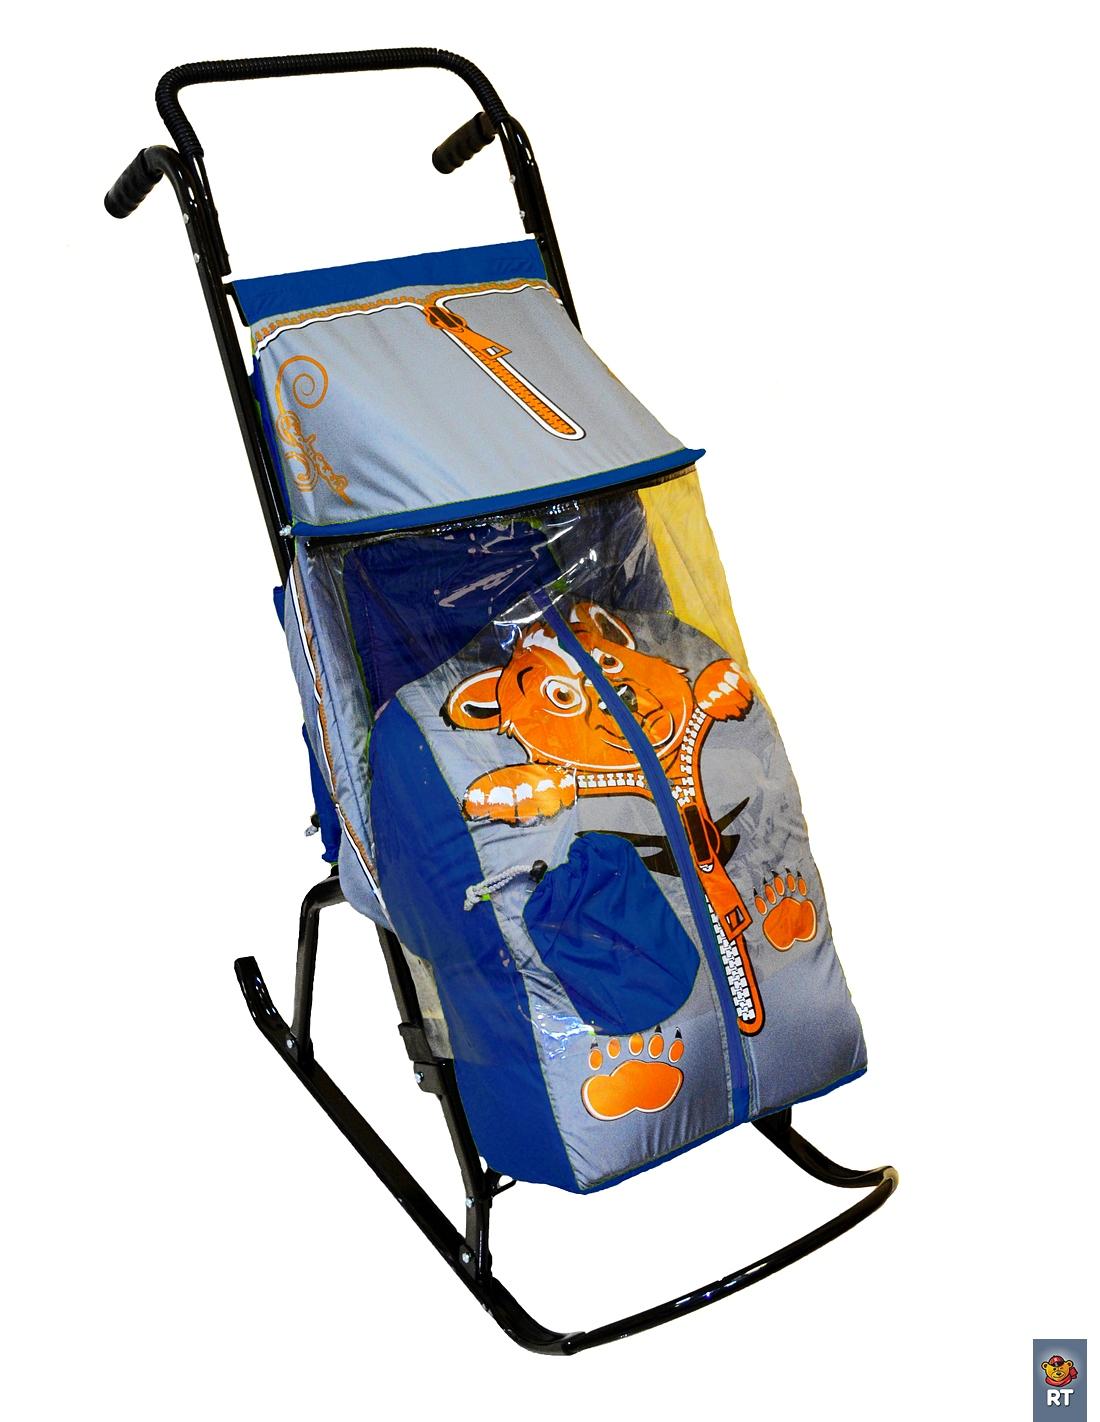 Санки-коляска Снегурочка-2-Р Медвежонок, цвет синий-серыйСанки и сани-коляски<br>Санки-коляска Снегурочка-2-Р Медвежонок, цвет синий-серый<br>